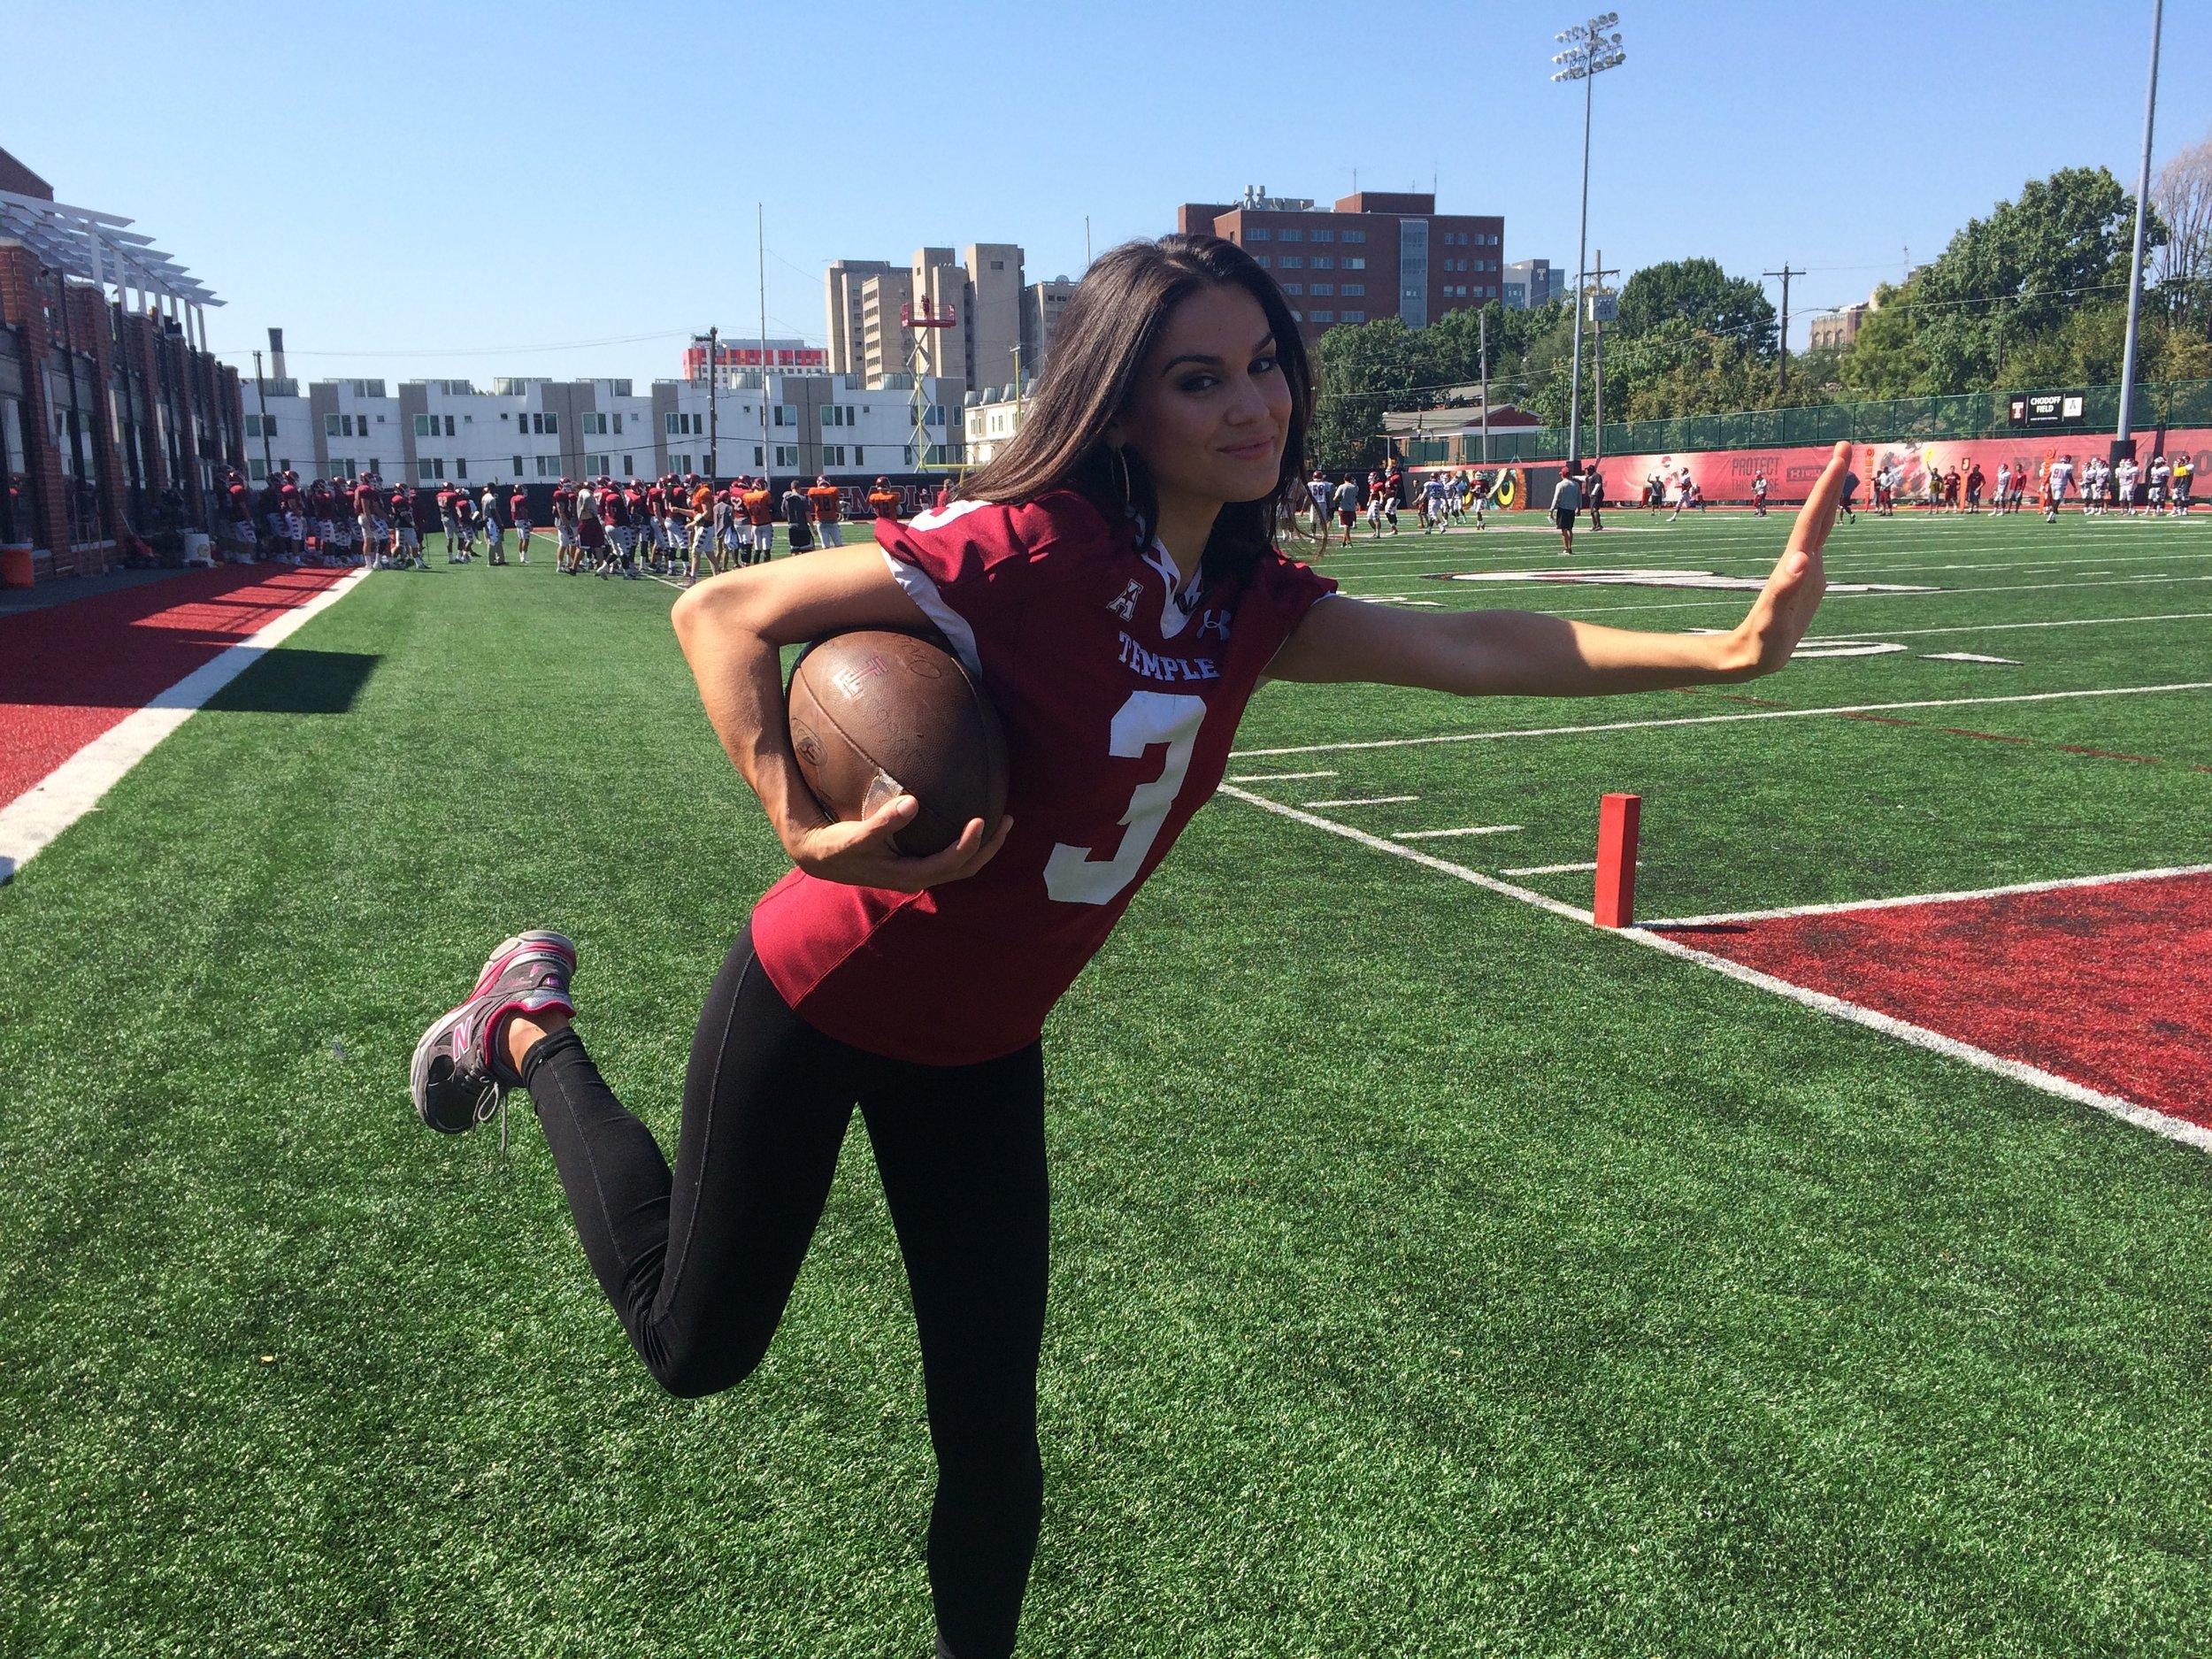 Nicole Brewer strikes her best Heisman pose, in honor of Temple's football team!